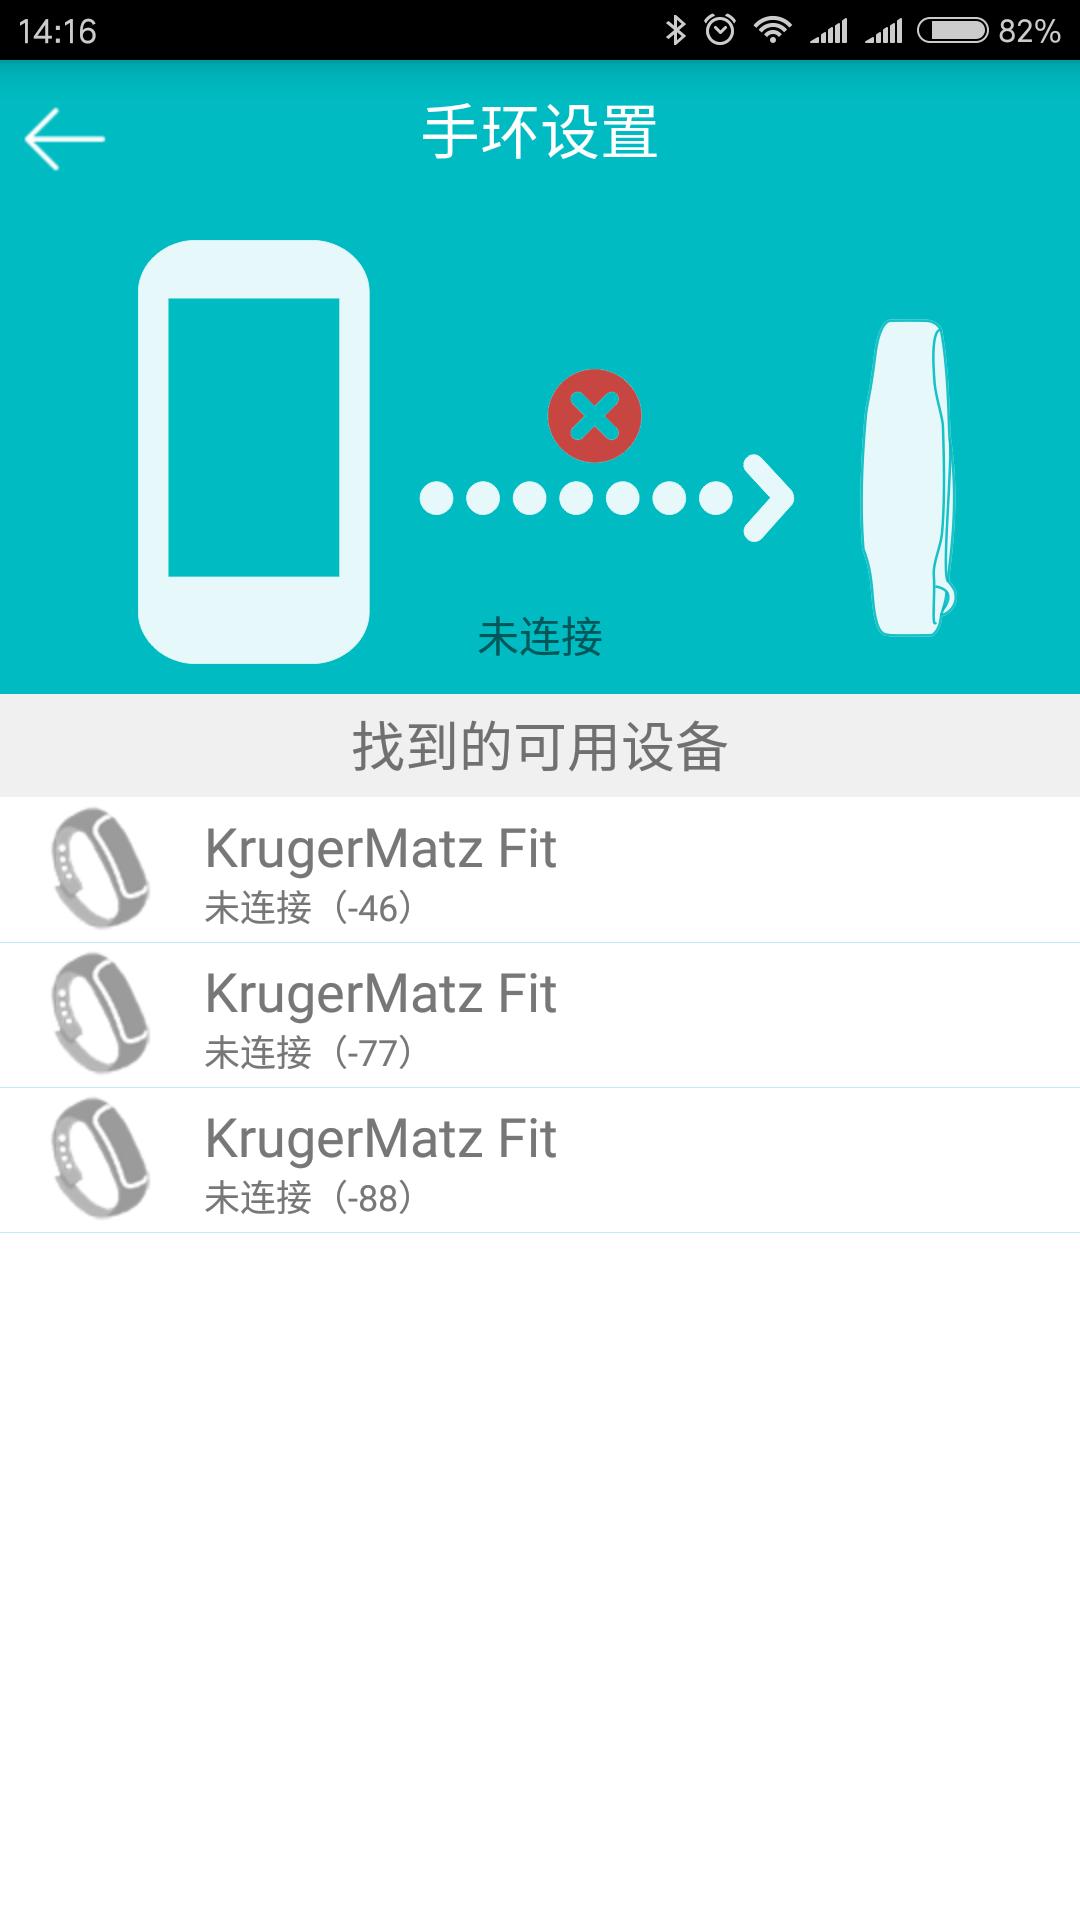 KrugerMatz Fit